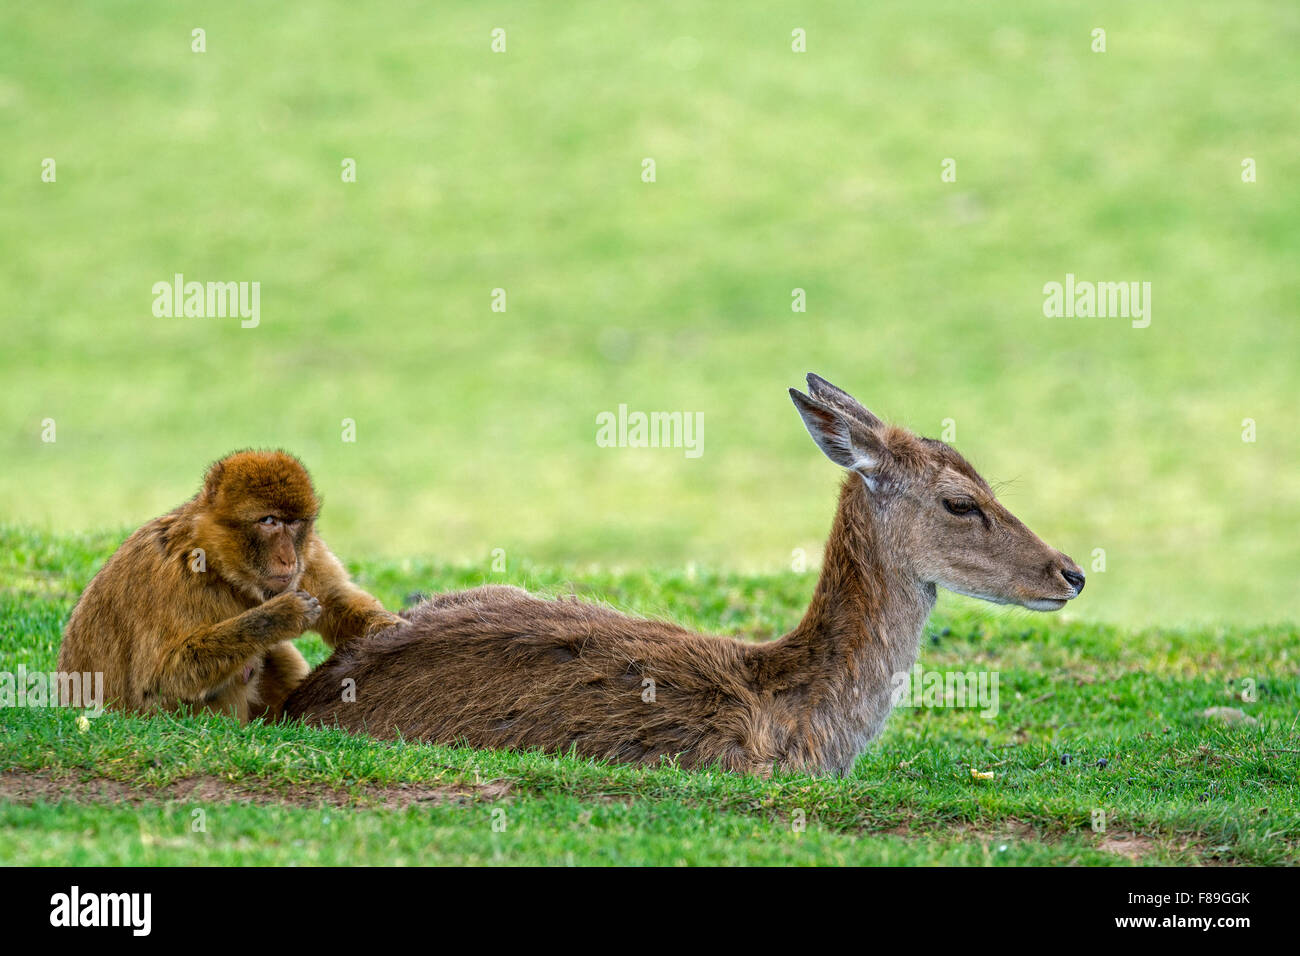 Macaque de Barbarie / Barbary ape / magot (Macaca sylvanus) espèces de singes originaire du nord de l'Afrique Photo Stock